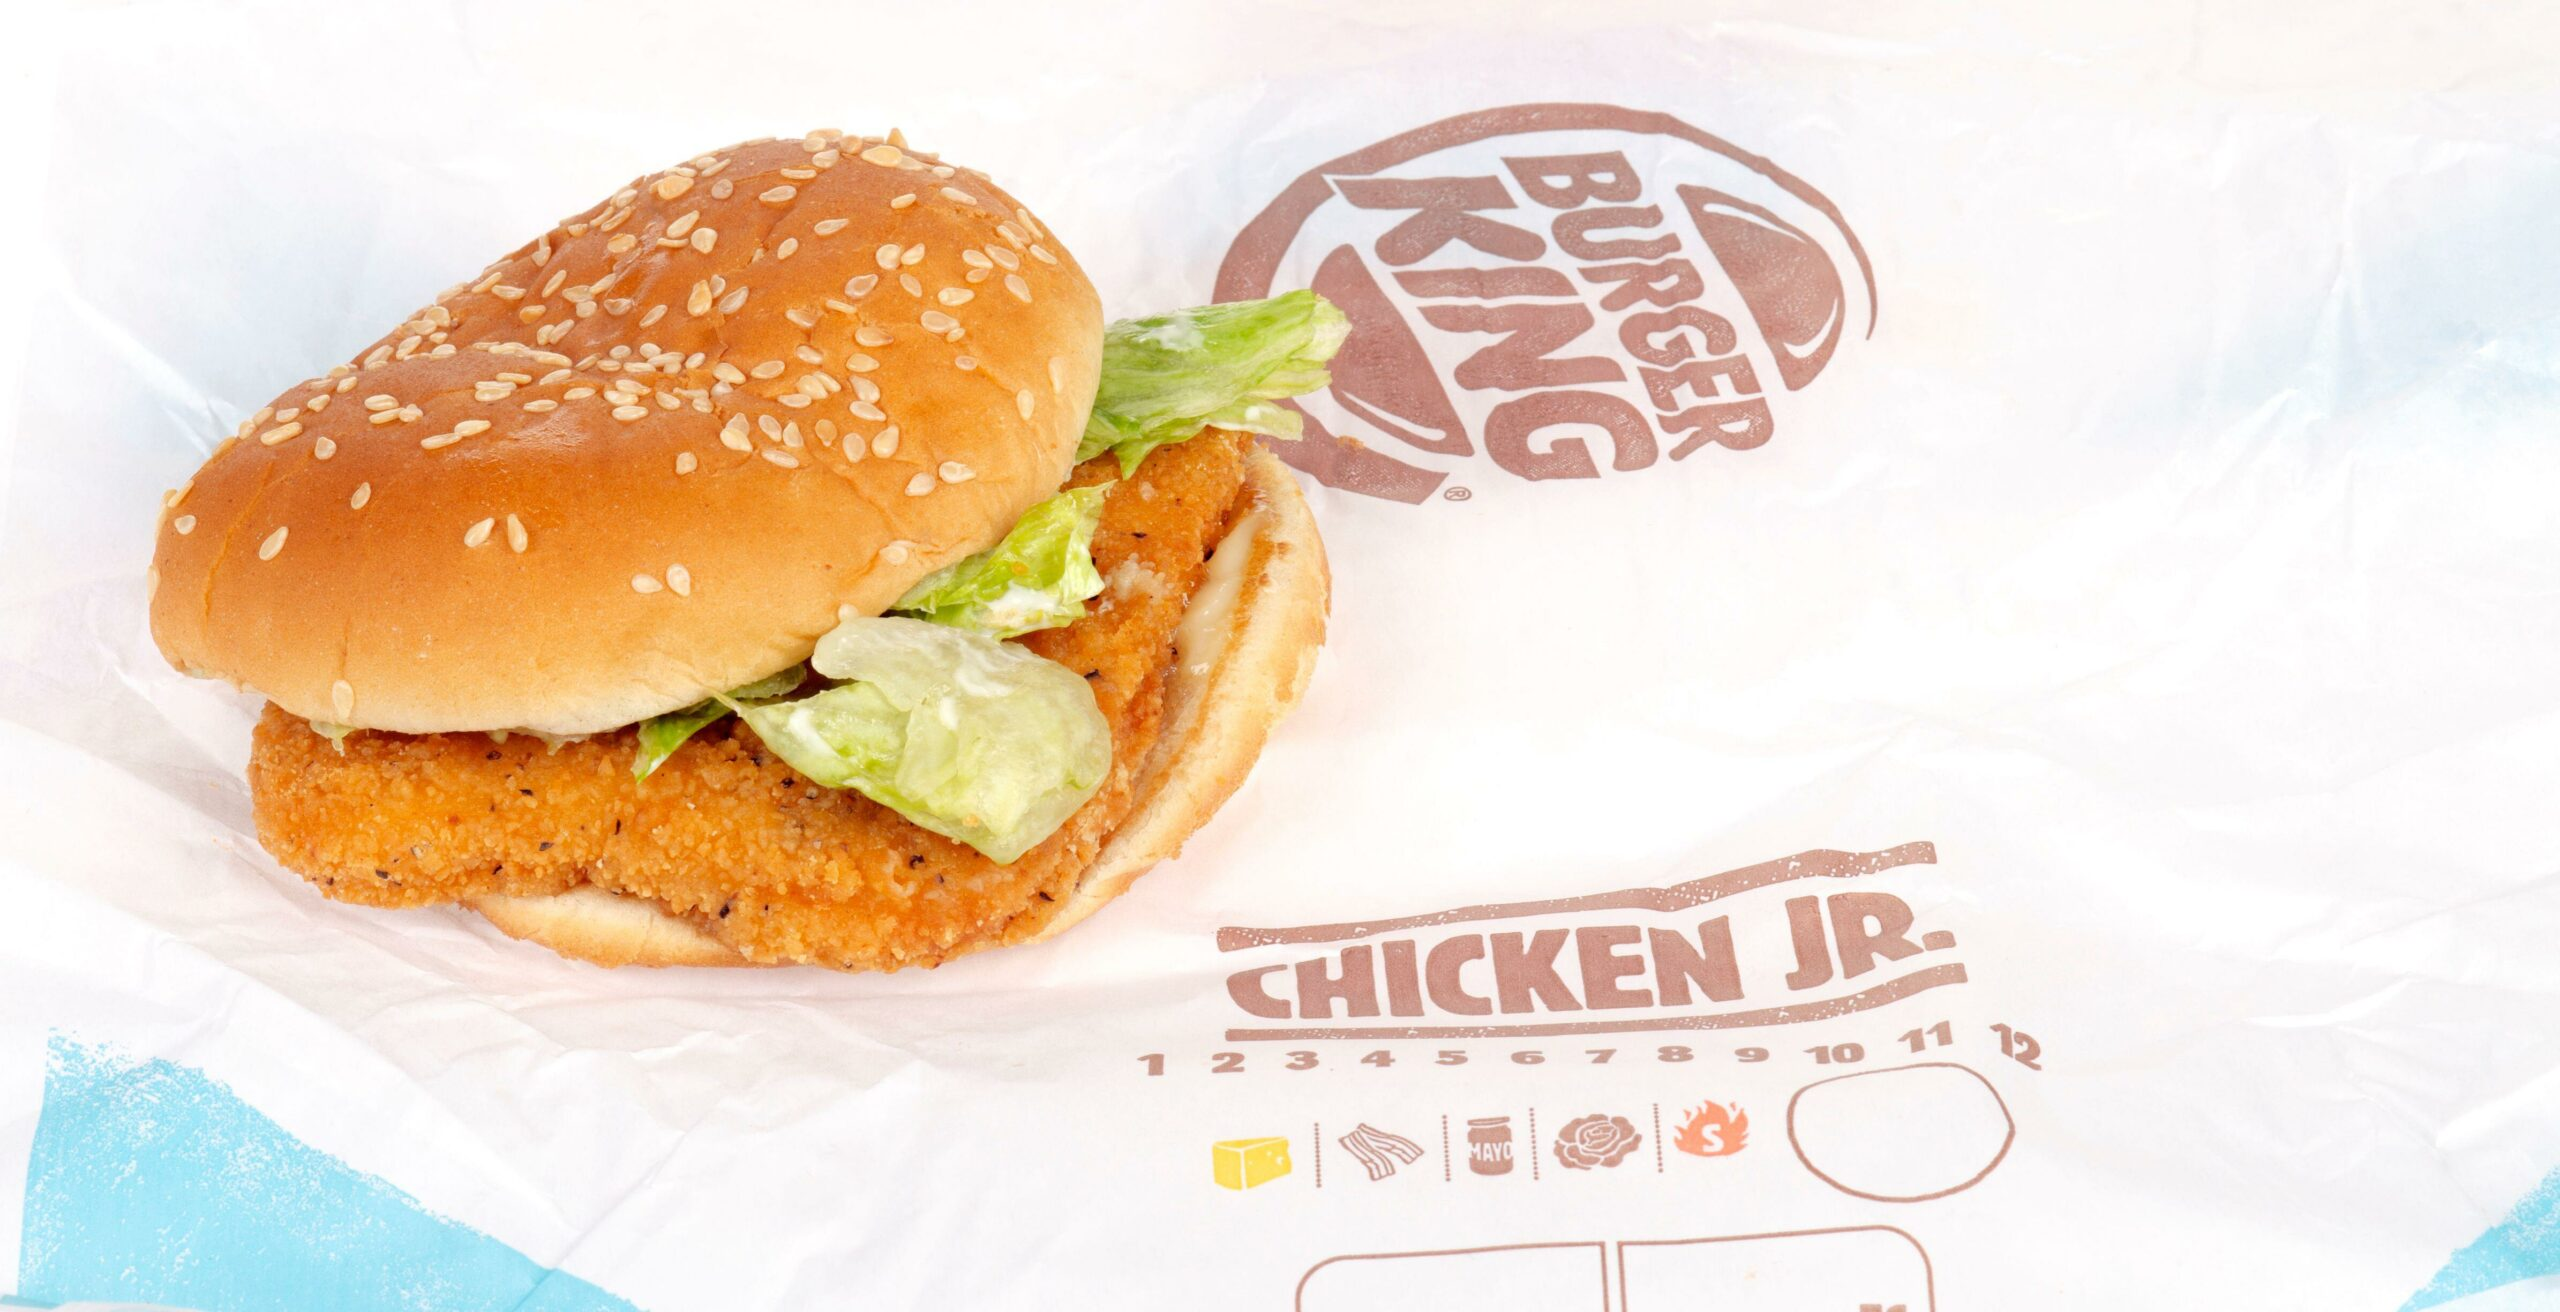 Burger King Chicken